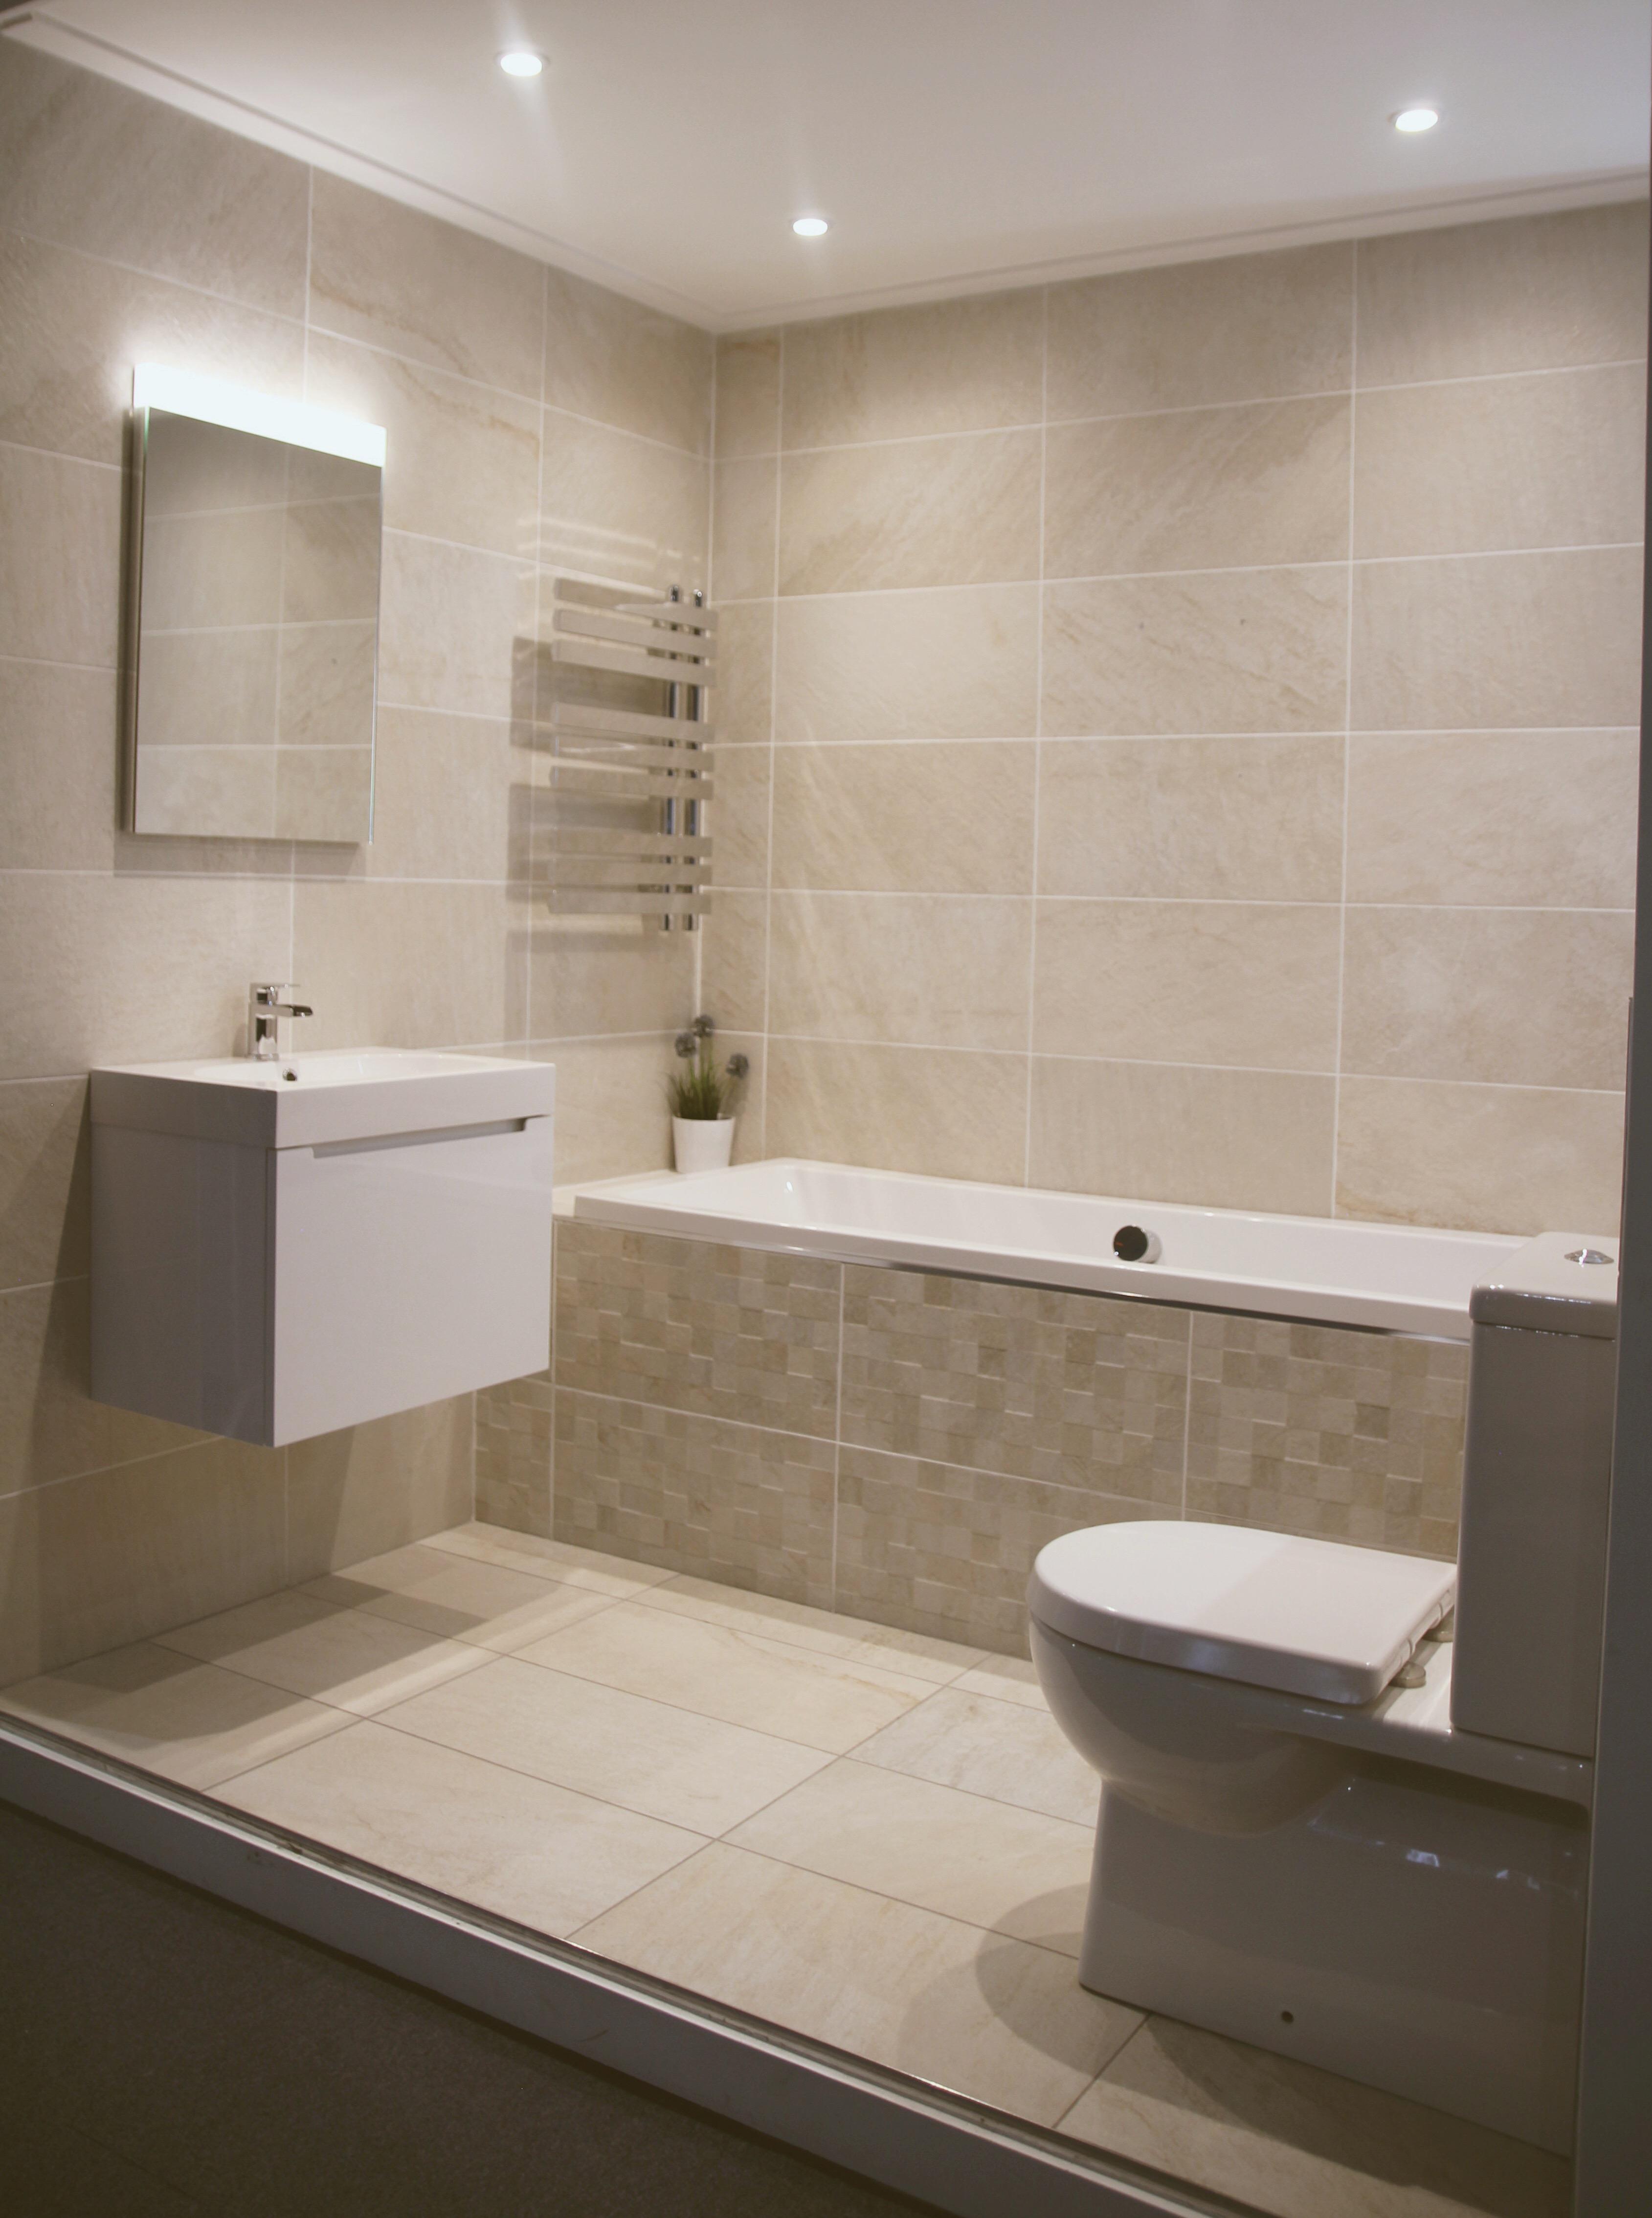 aria serenade bathtubs bathtub tag photo high showroom fleurco resolution tub